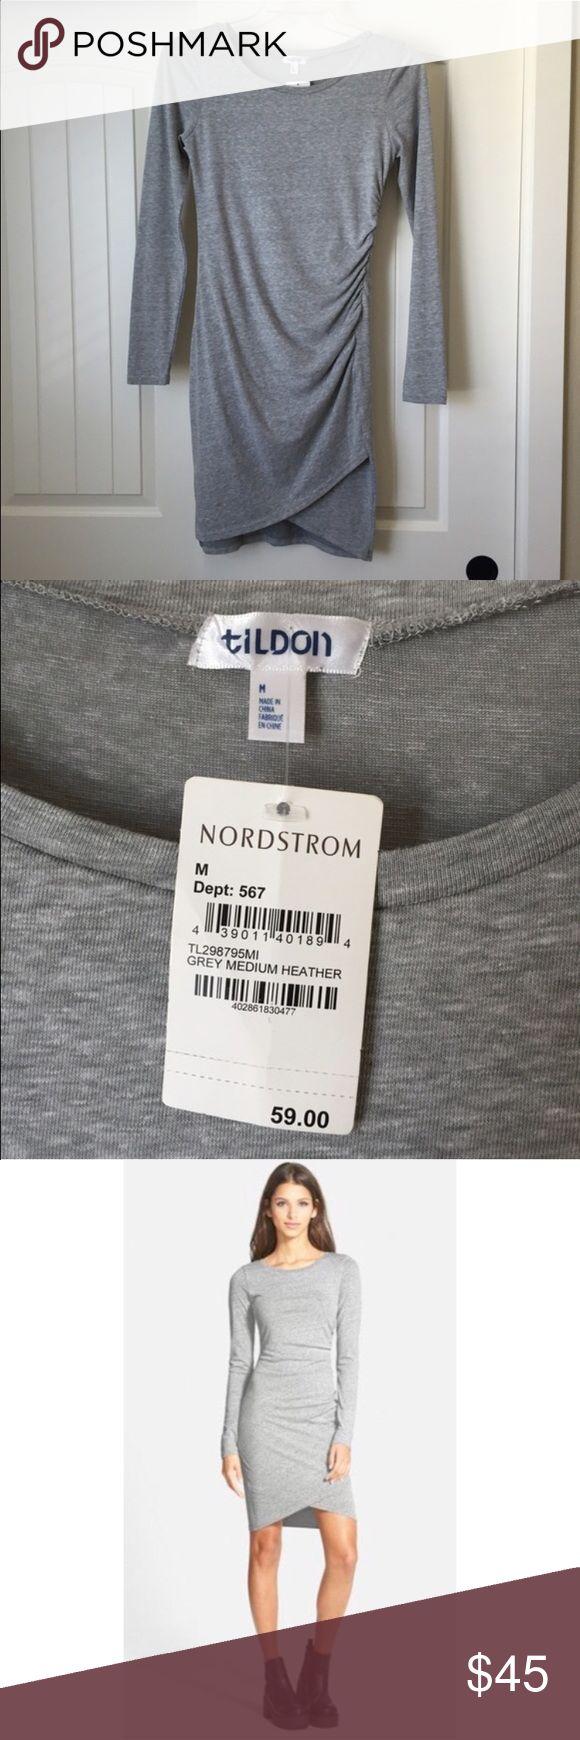 Heather Grey Long Sleeve Dress NWT! Tildon heather grey long sleeve dress. 56% polyester 44% cotton. Body-con style dress Tildon Dresses